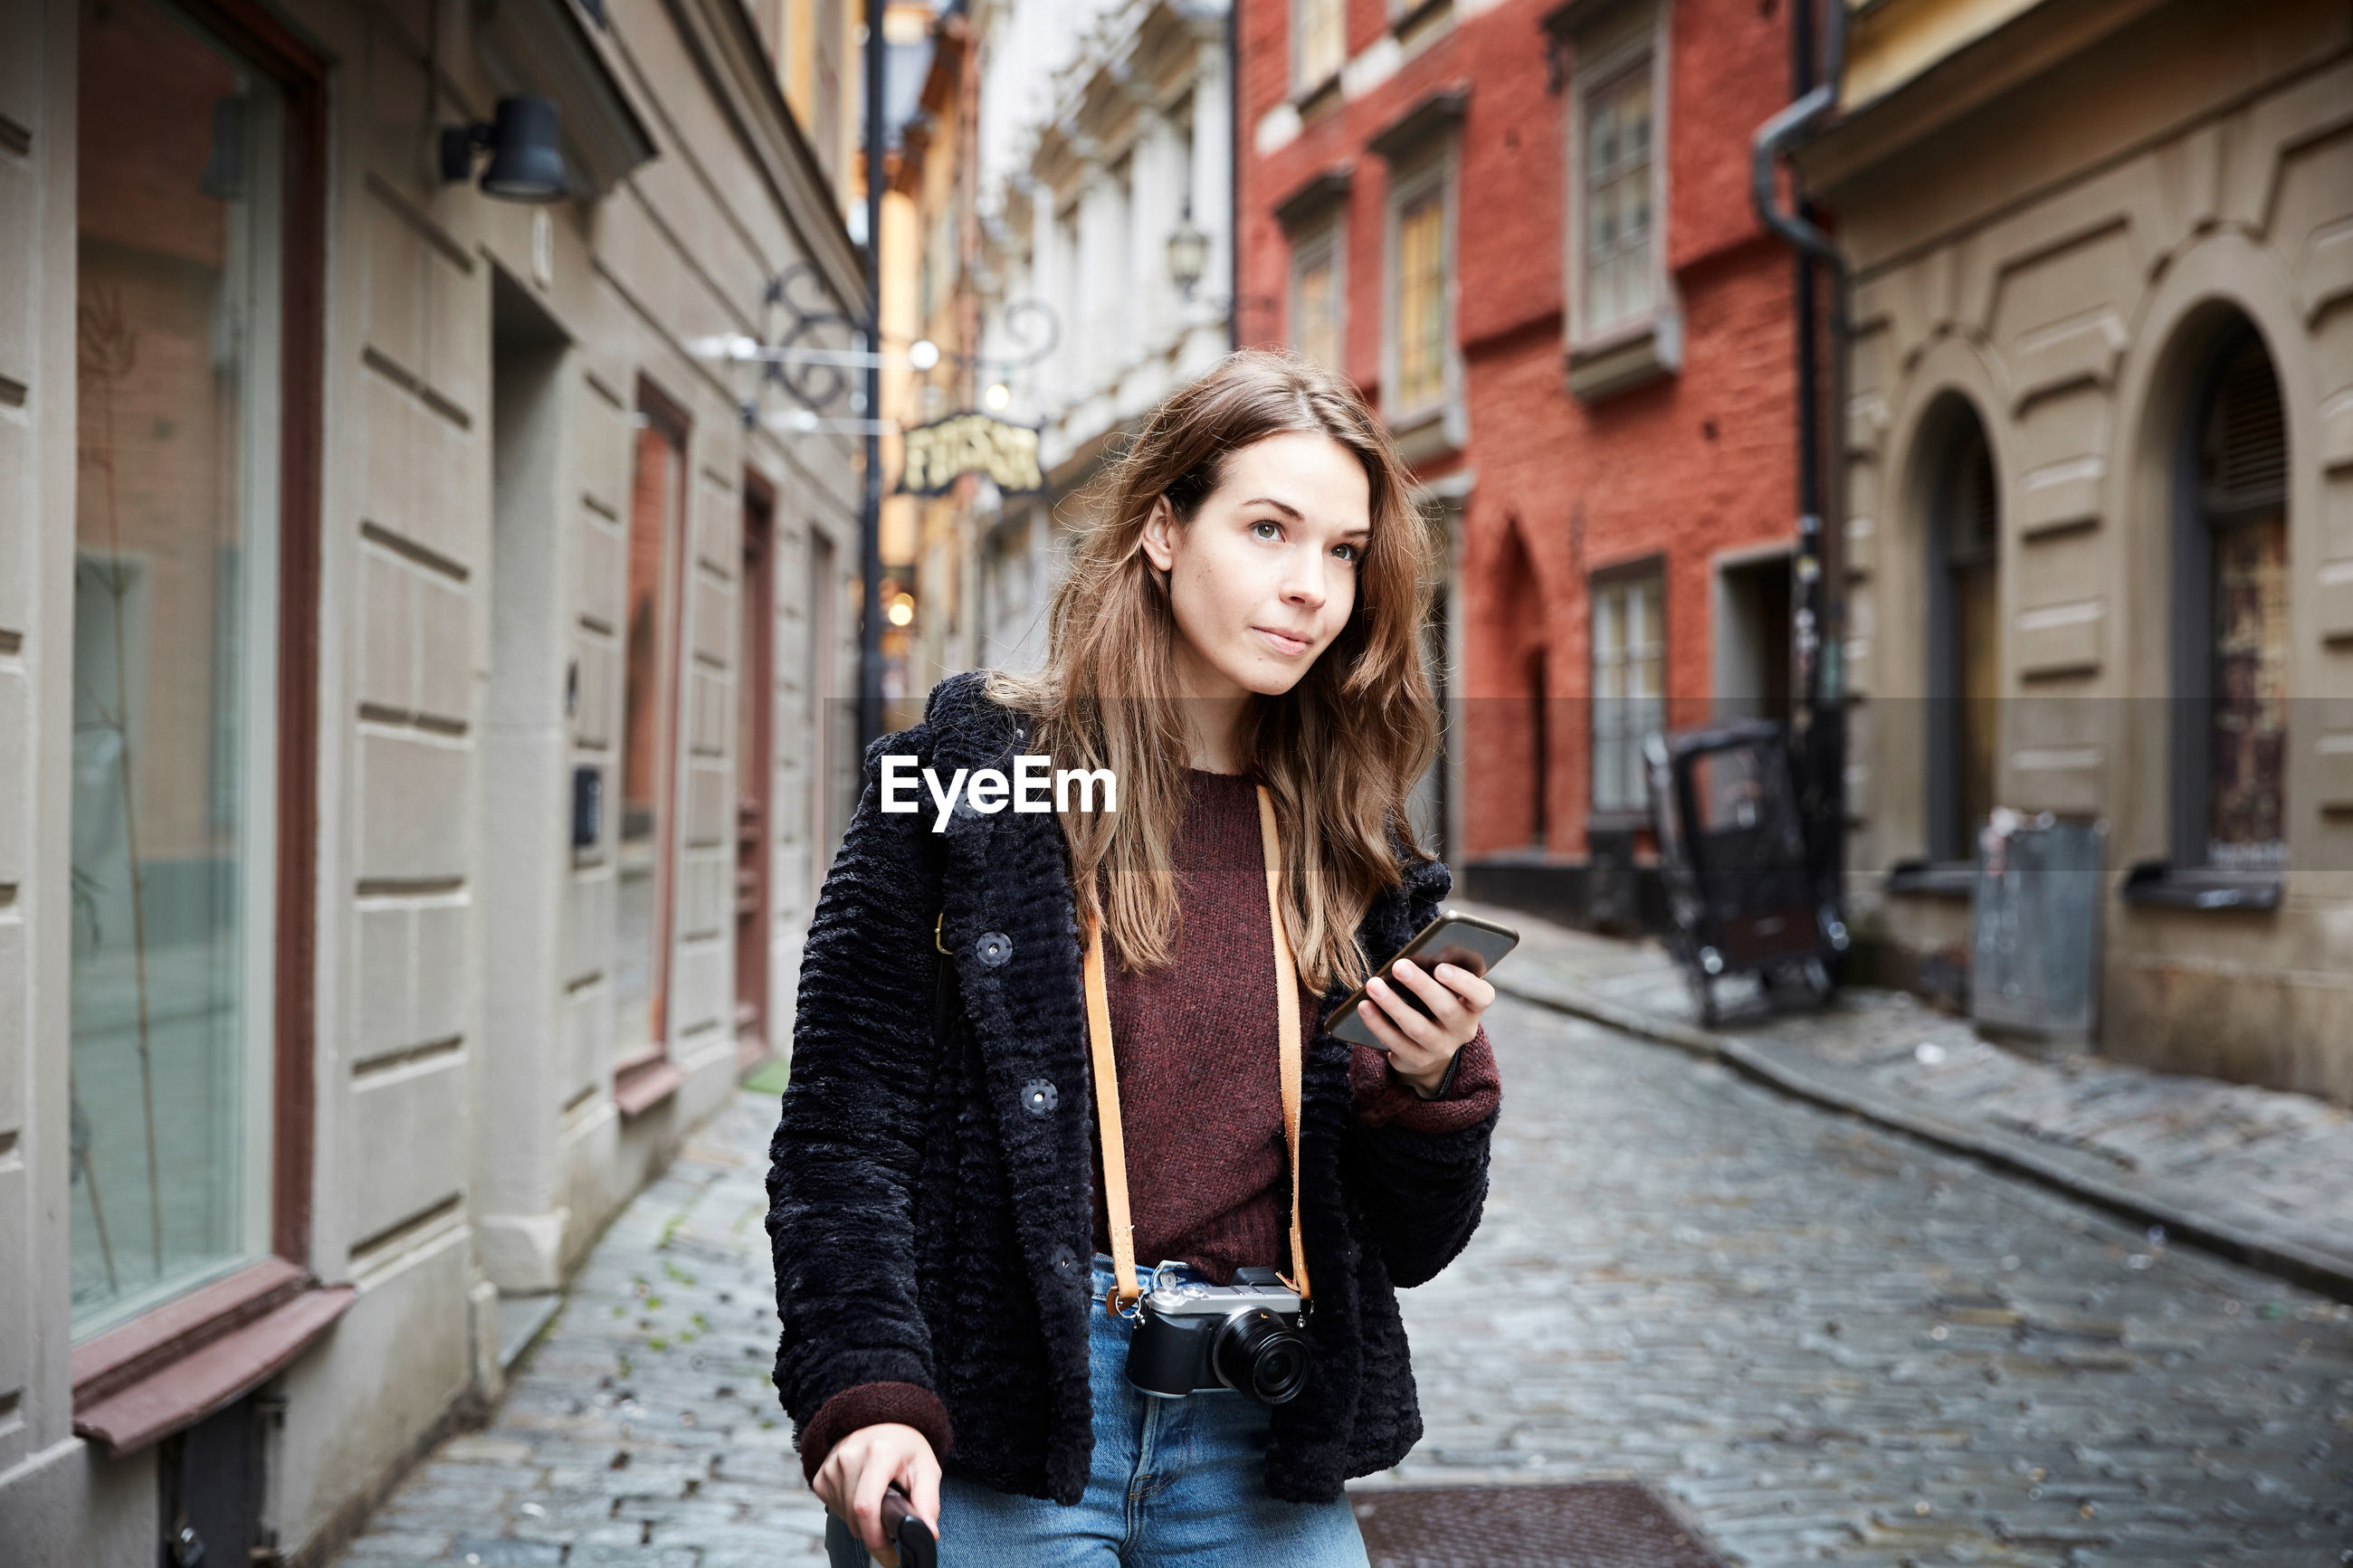 FULL LENGTH PORTRAIT OF WOMAN STANDING ON STREET